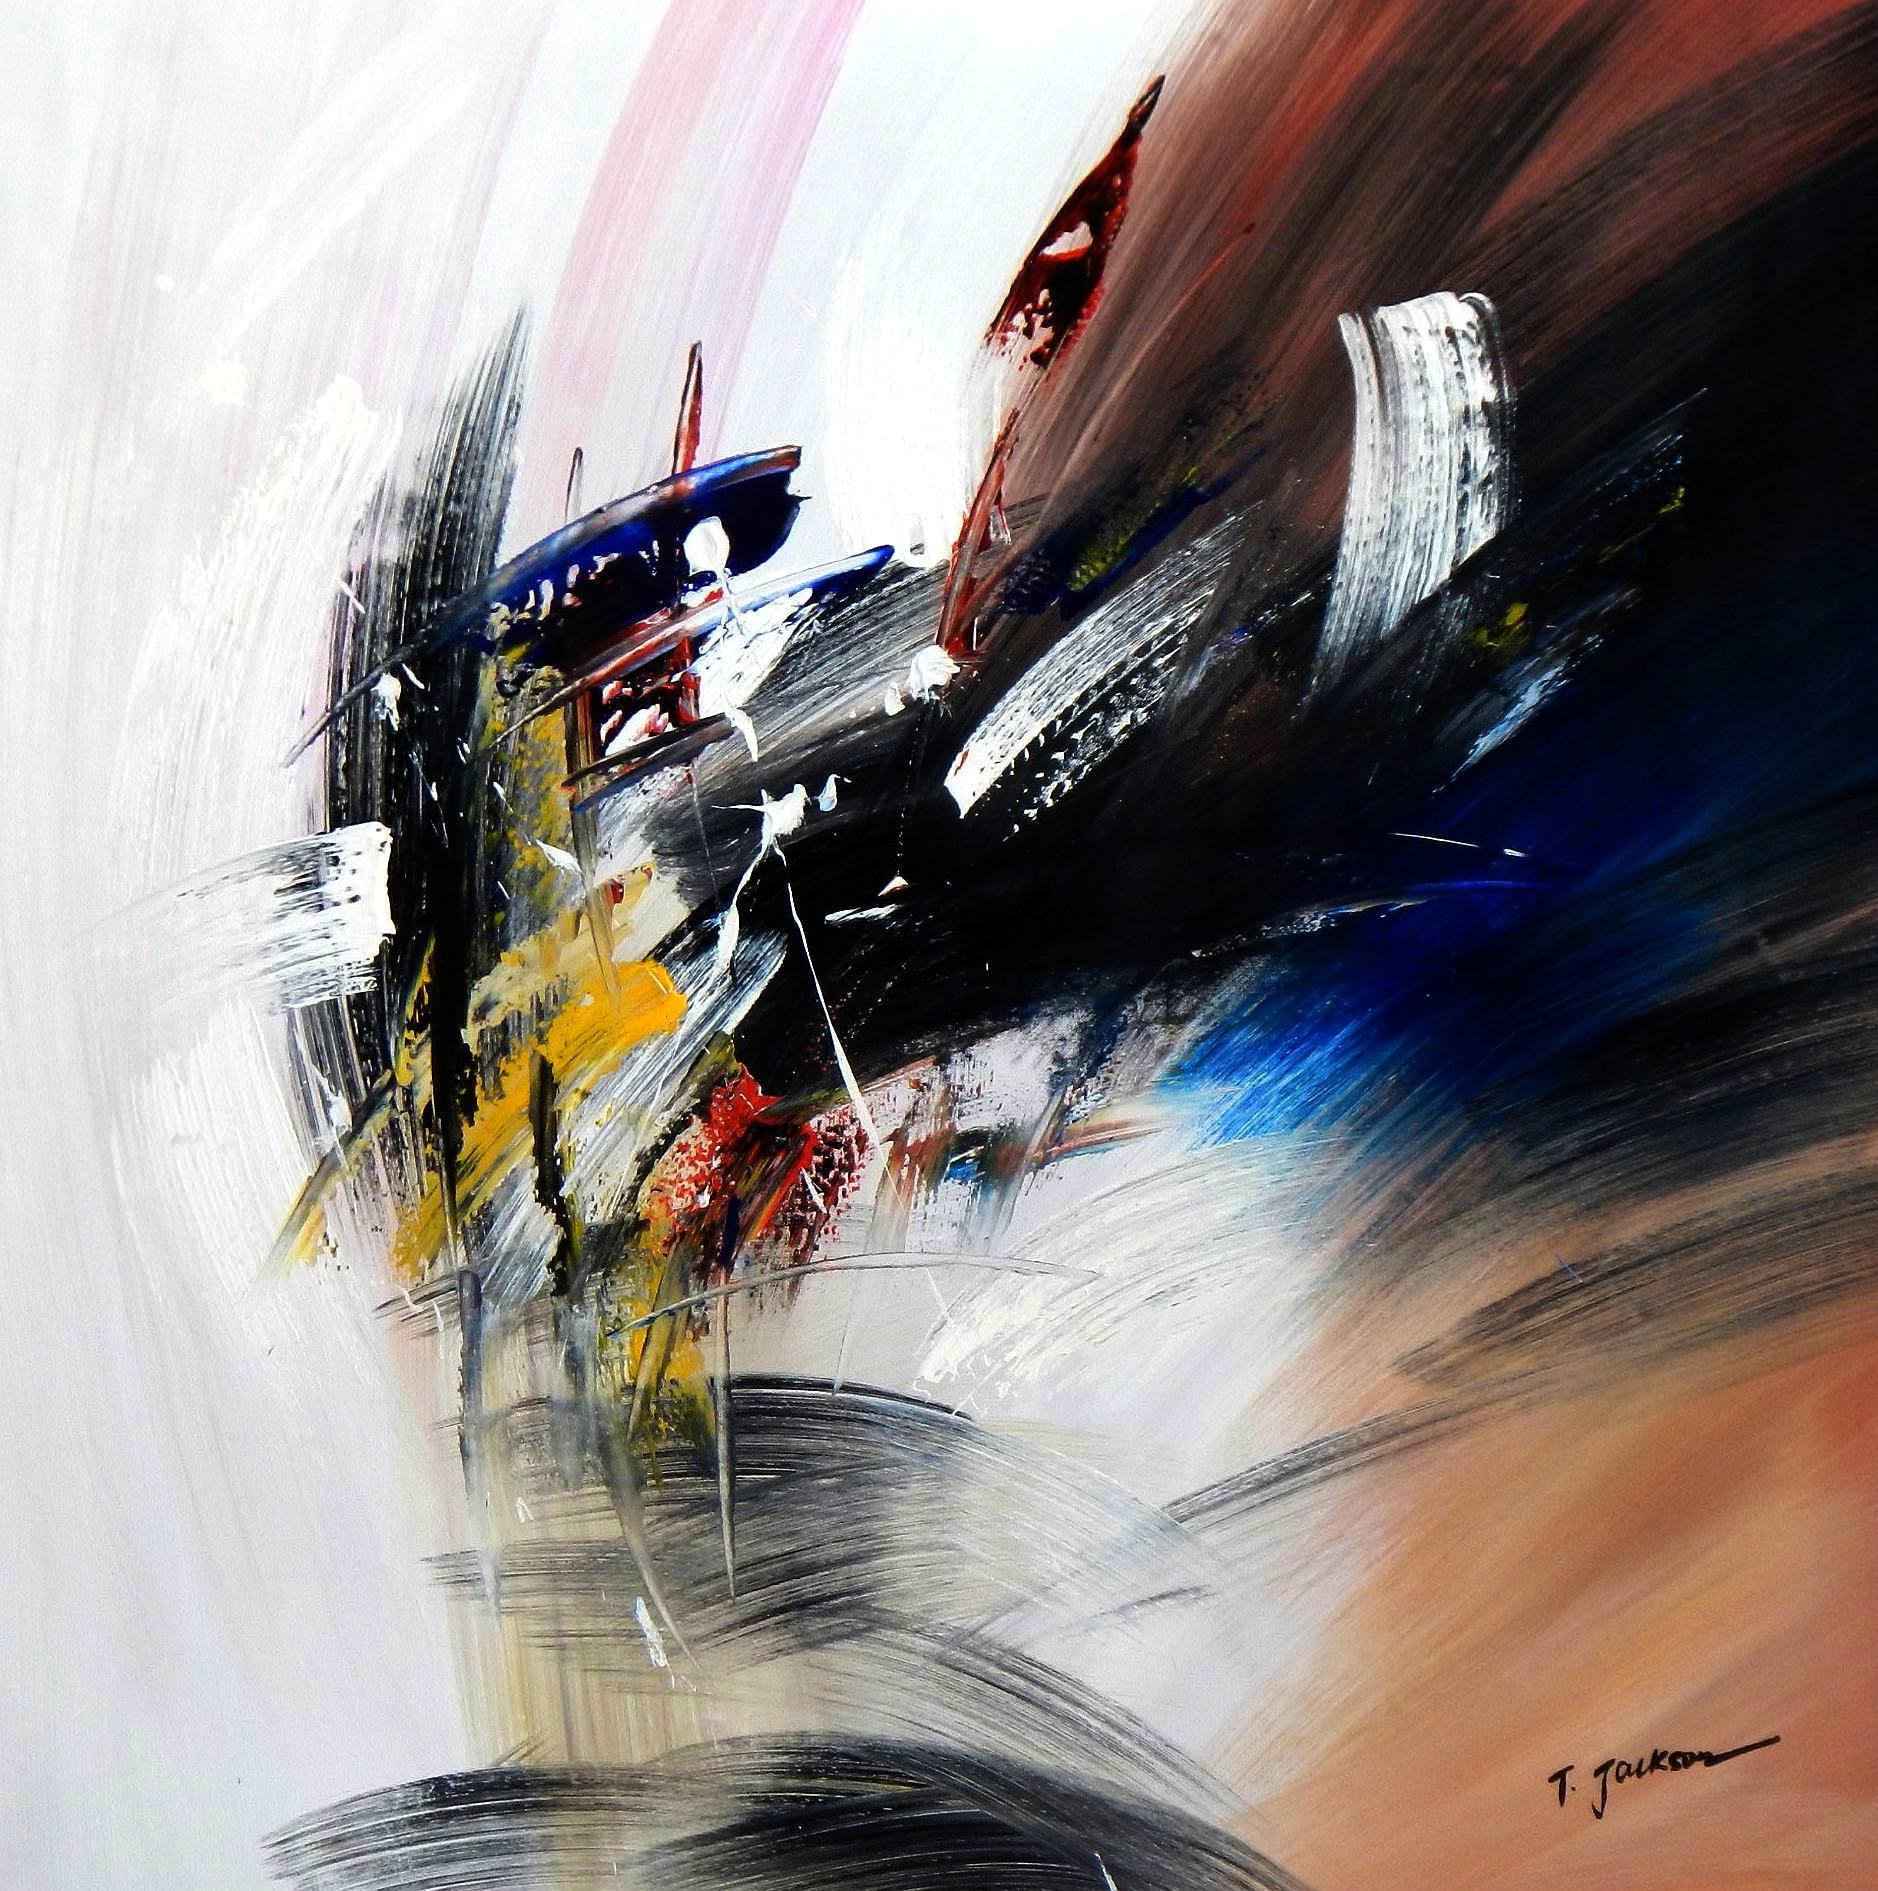 Abstract - New York sailing journey g93996 80x80cm abstraktes Ölgemälde handgemalt